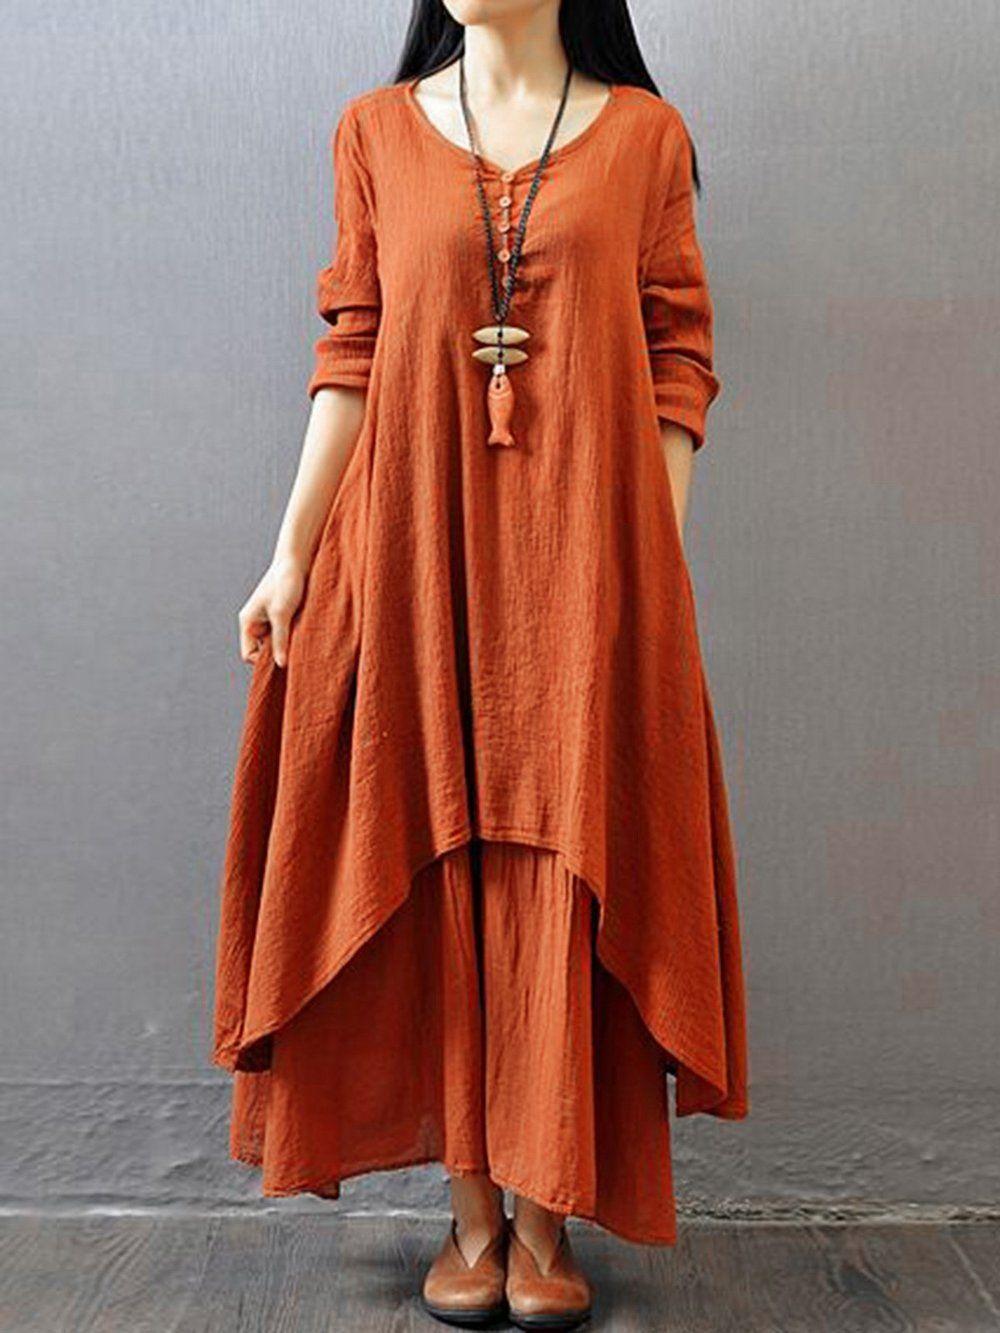 Plus Size Women Asymmetrical Daily 3 4 Sleeve Casual Asymmetric Solid Dress Linen Maxi Dress Maxi Dress With Sleeves Maxi Dress [ 1333 x 1000 Pixel ]